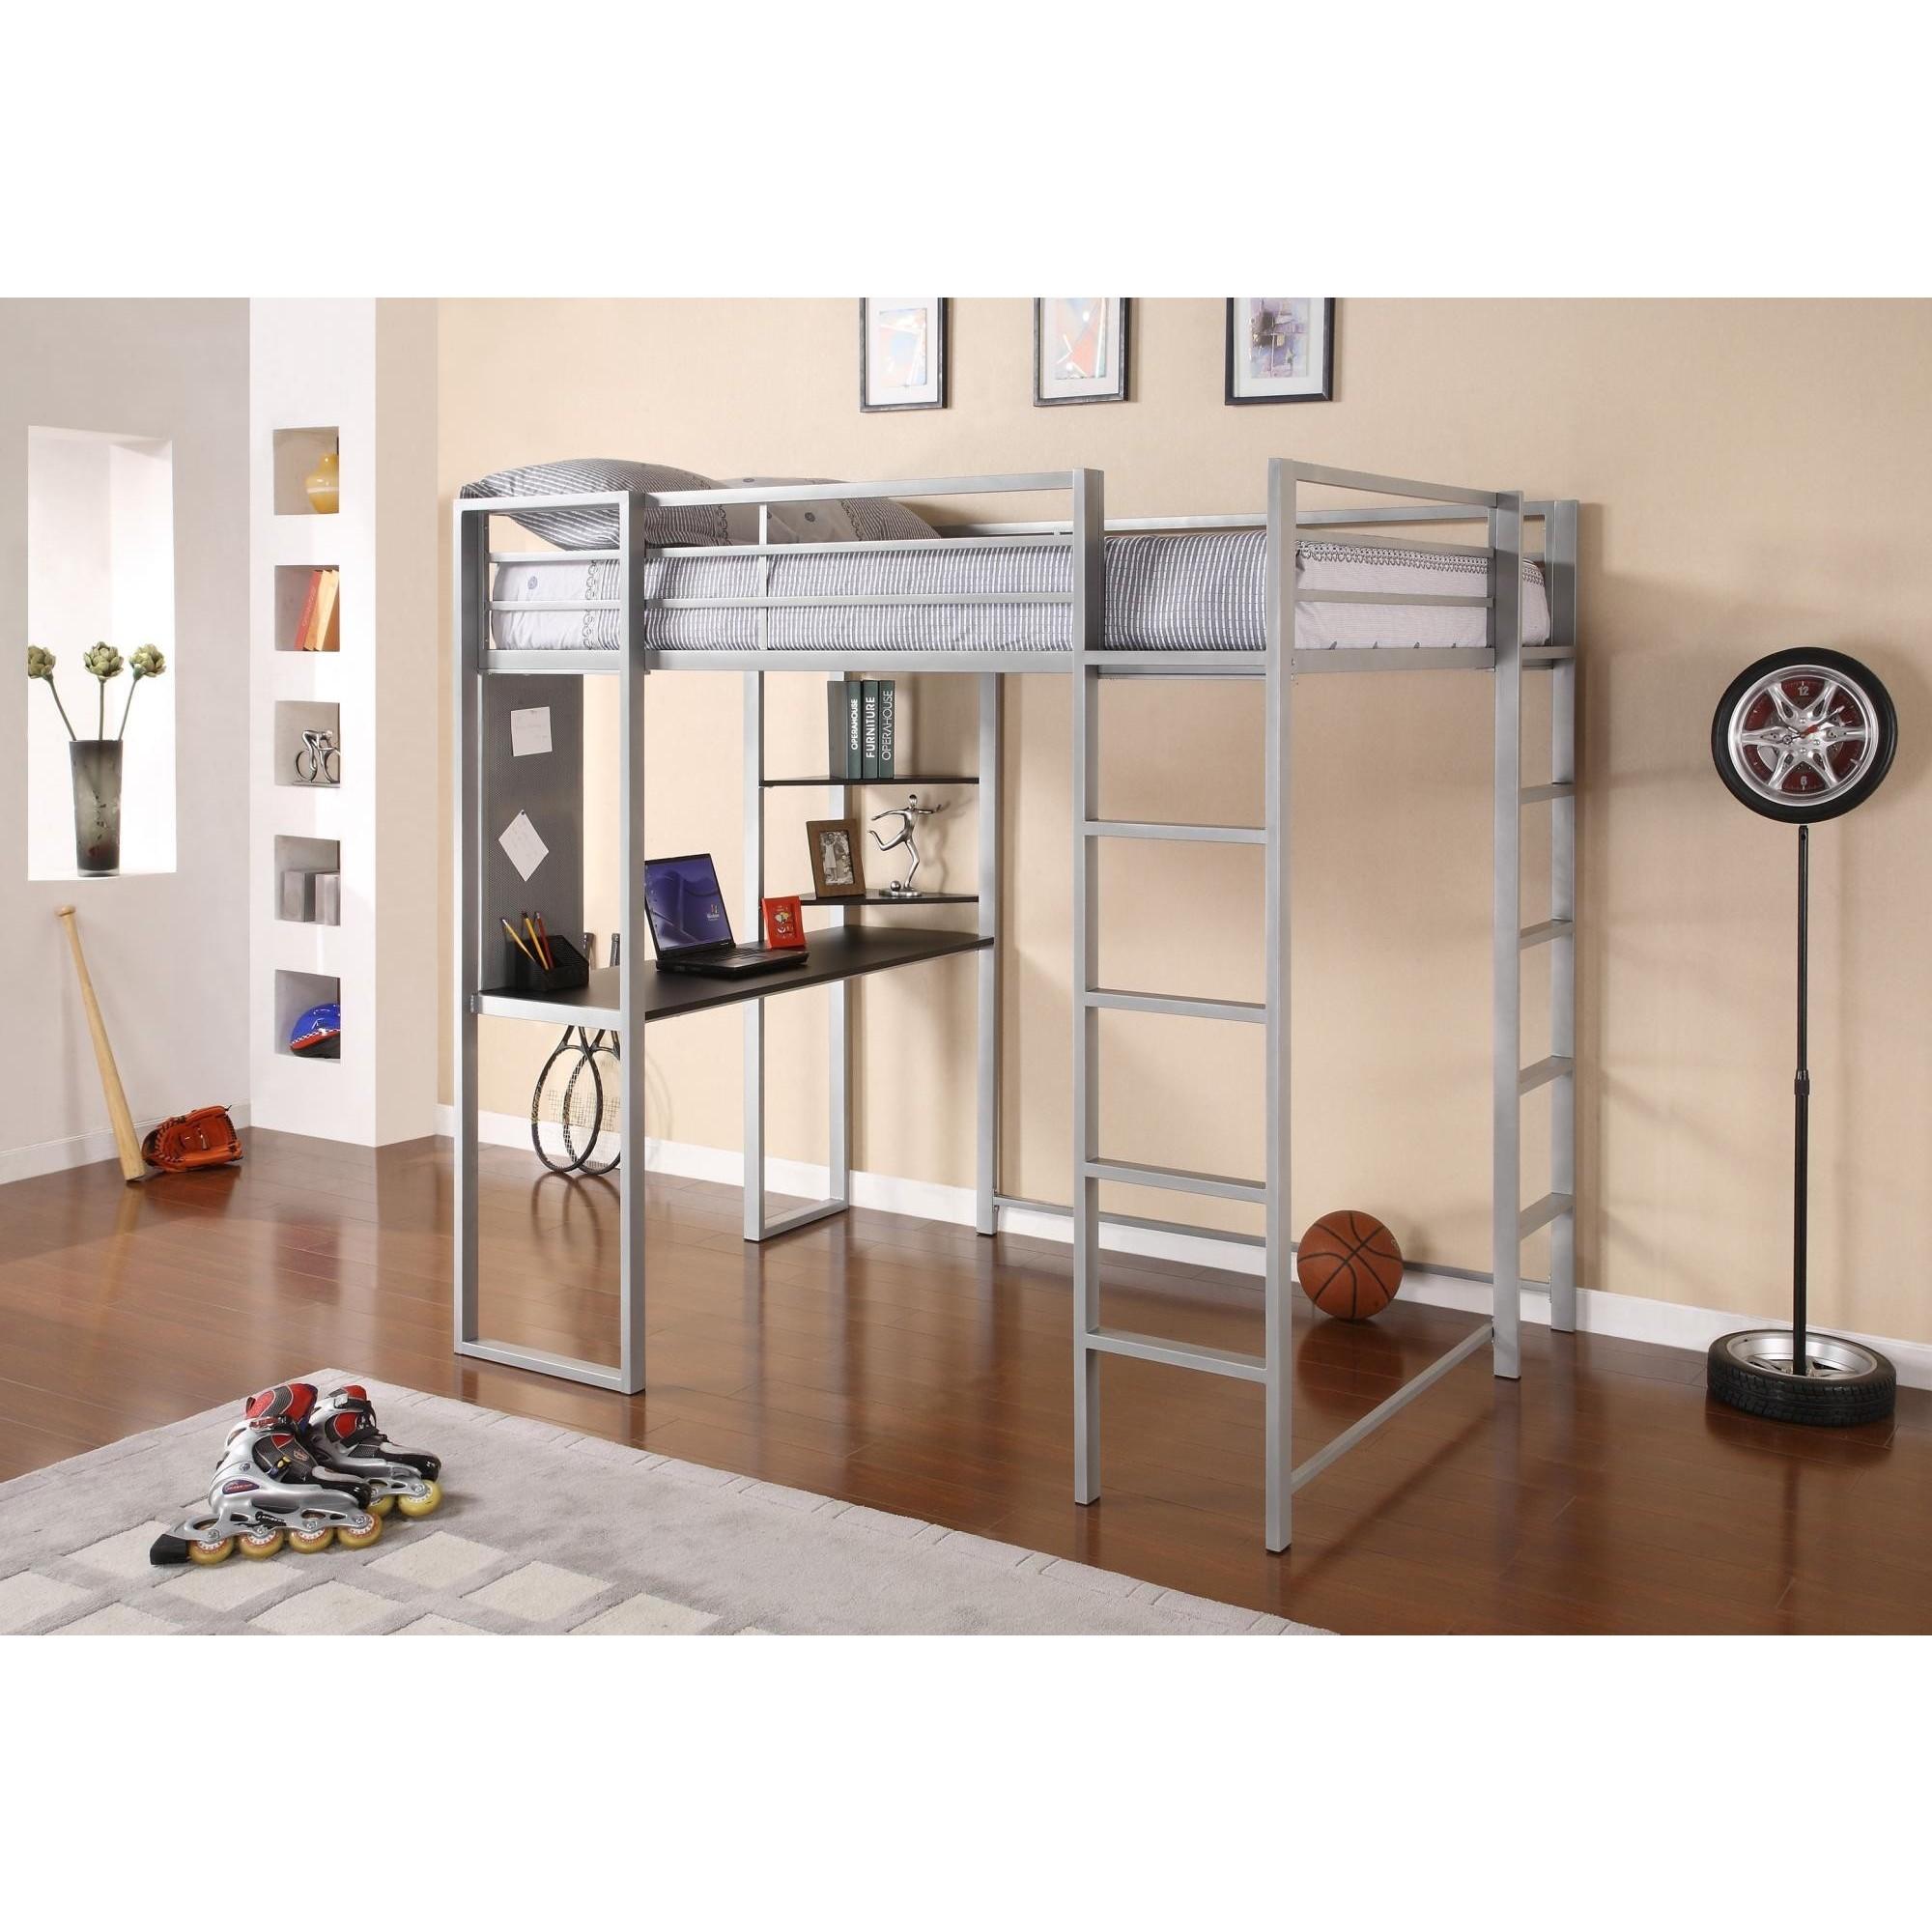 Clay Alder Home Blue Water Abode Full-size Metal Loft Bed